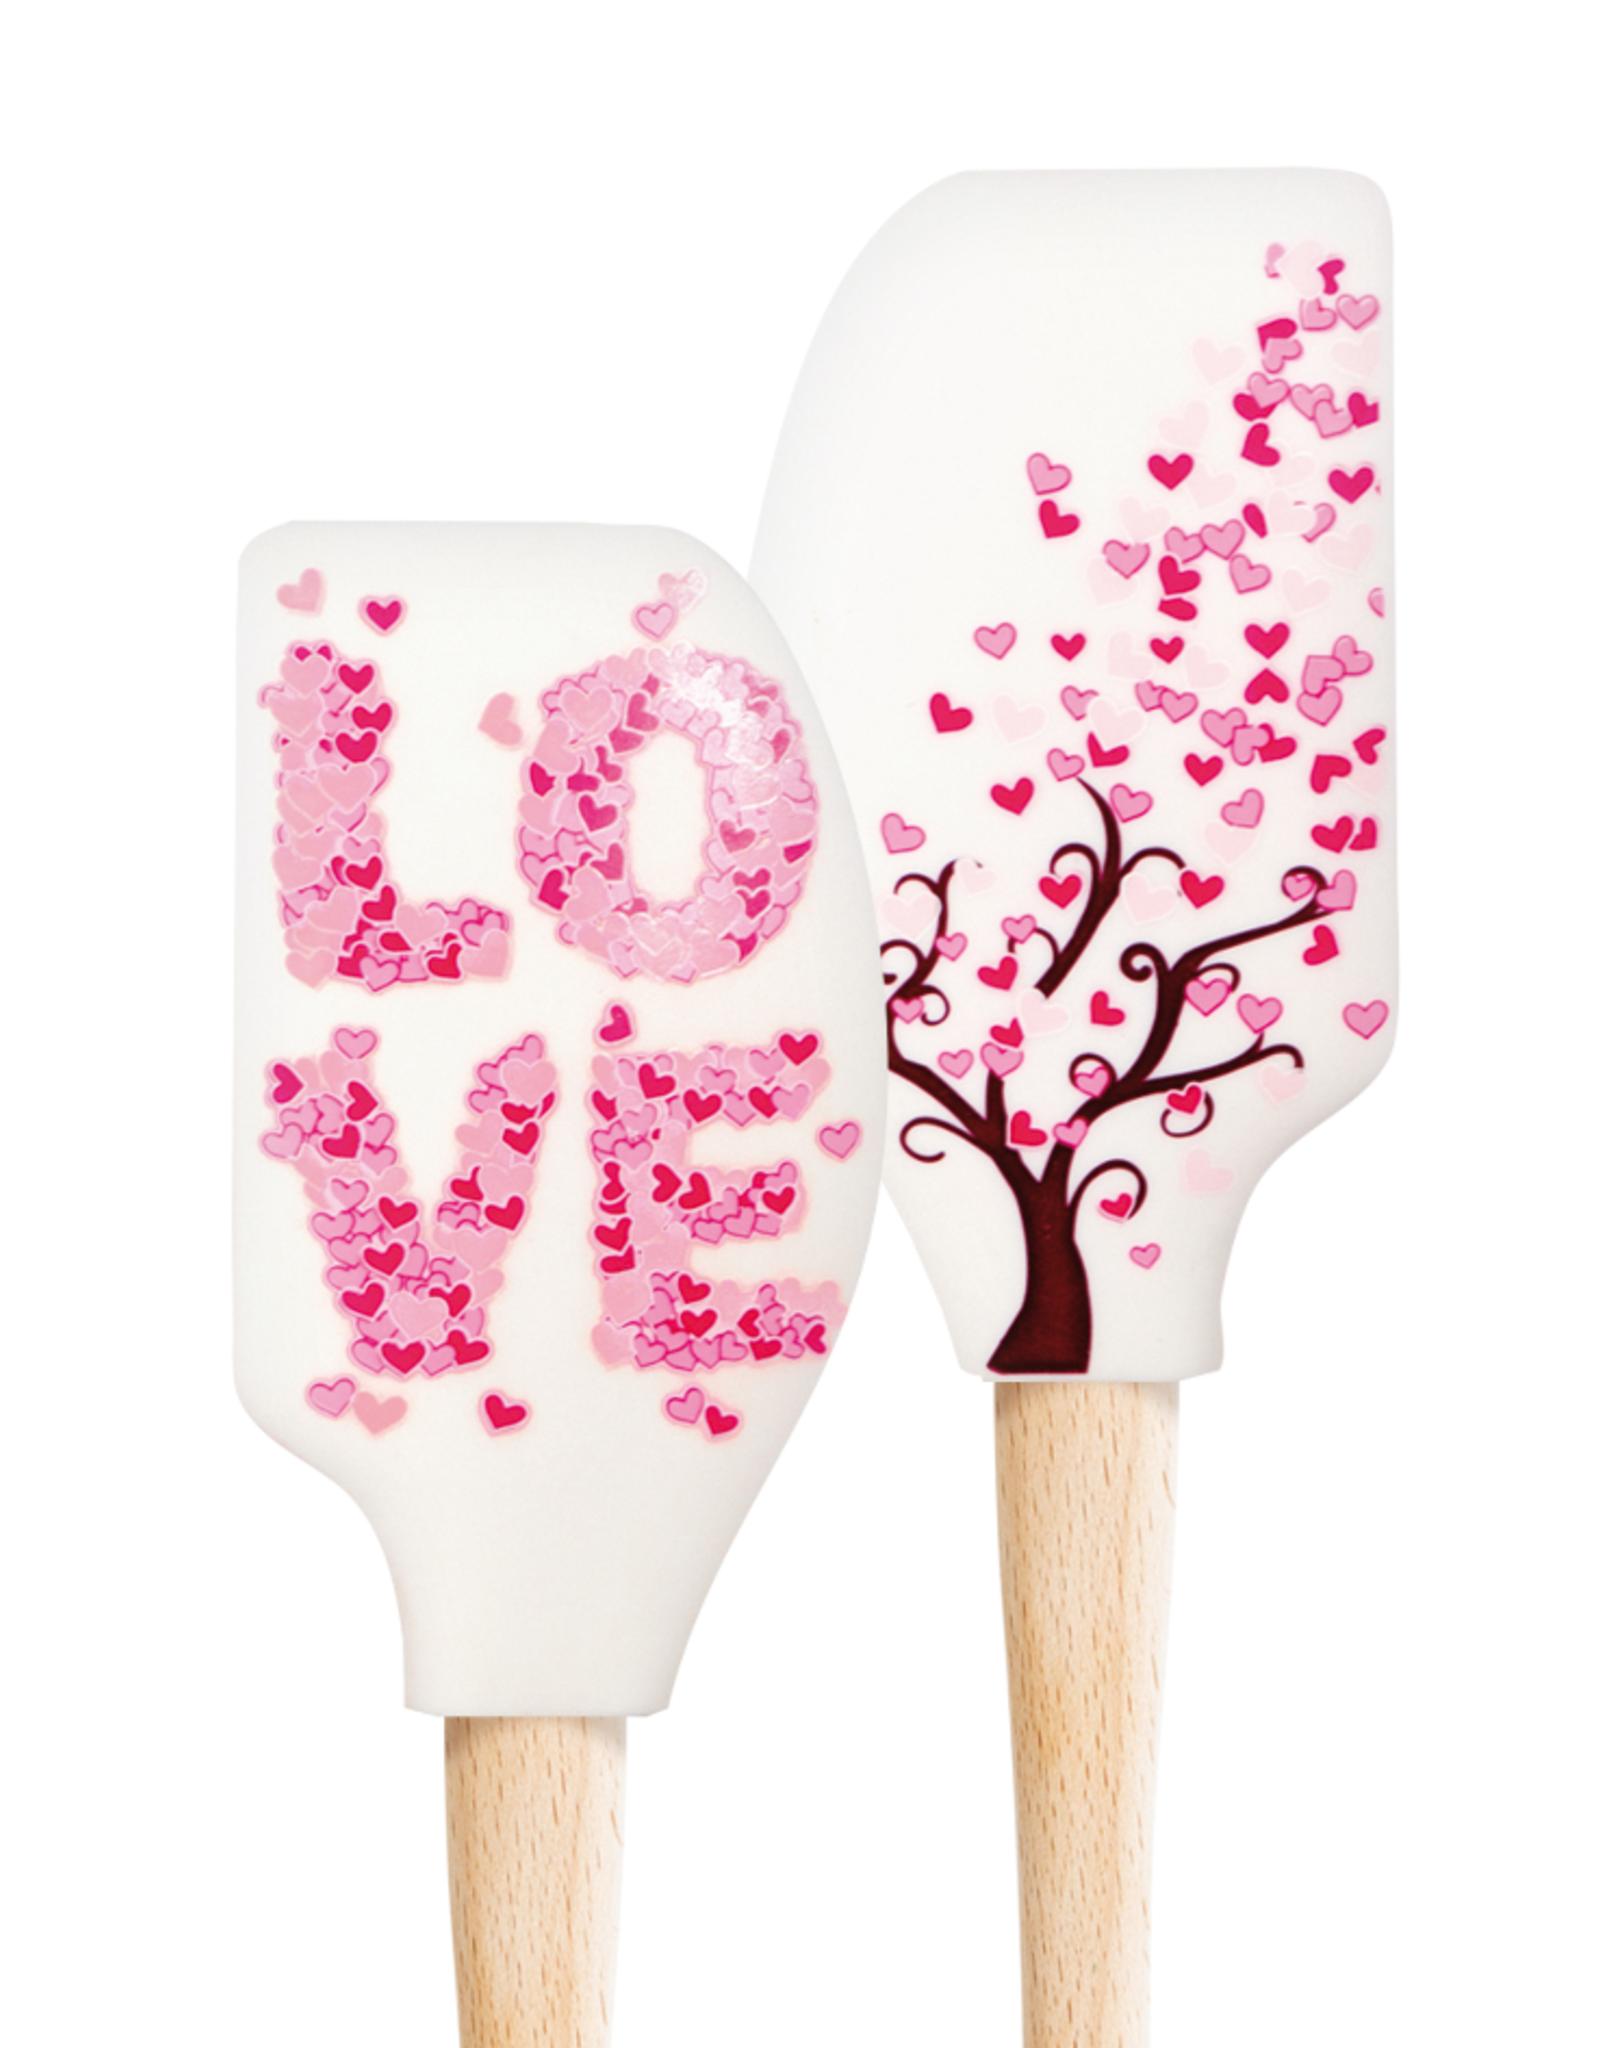 Tovolo Love Tree Spatula